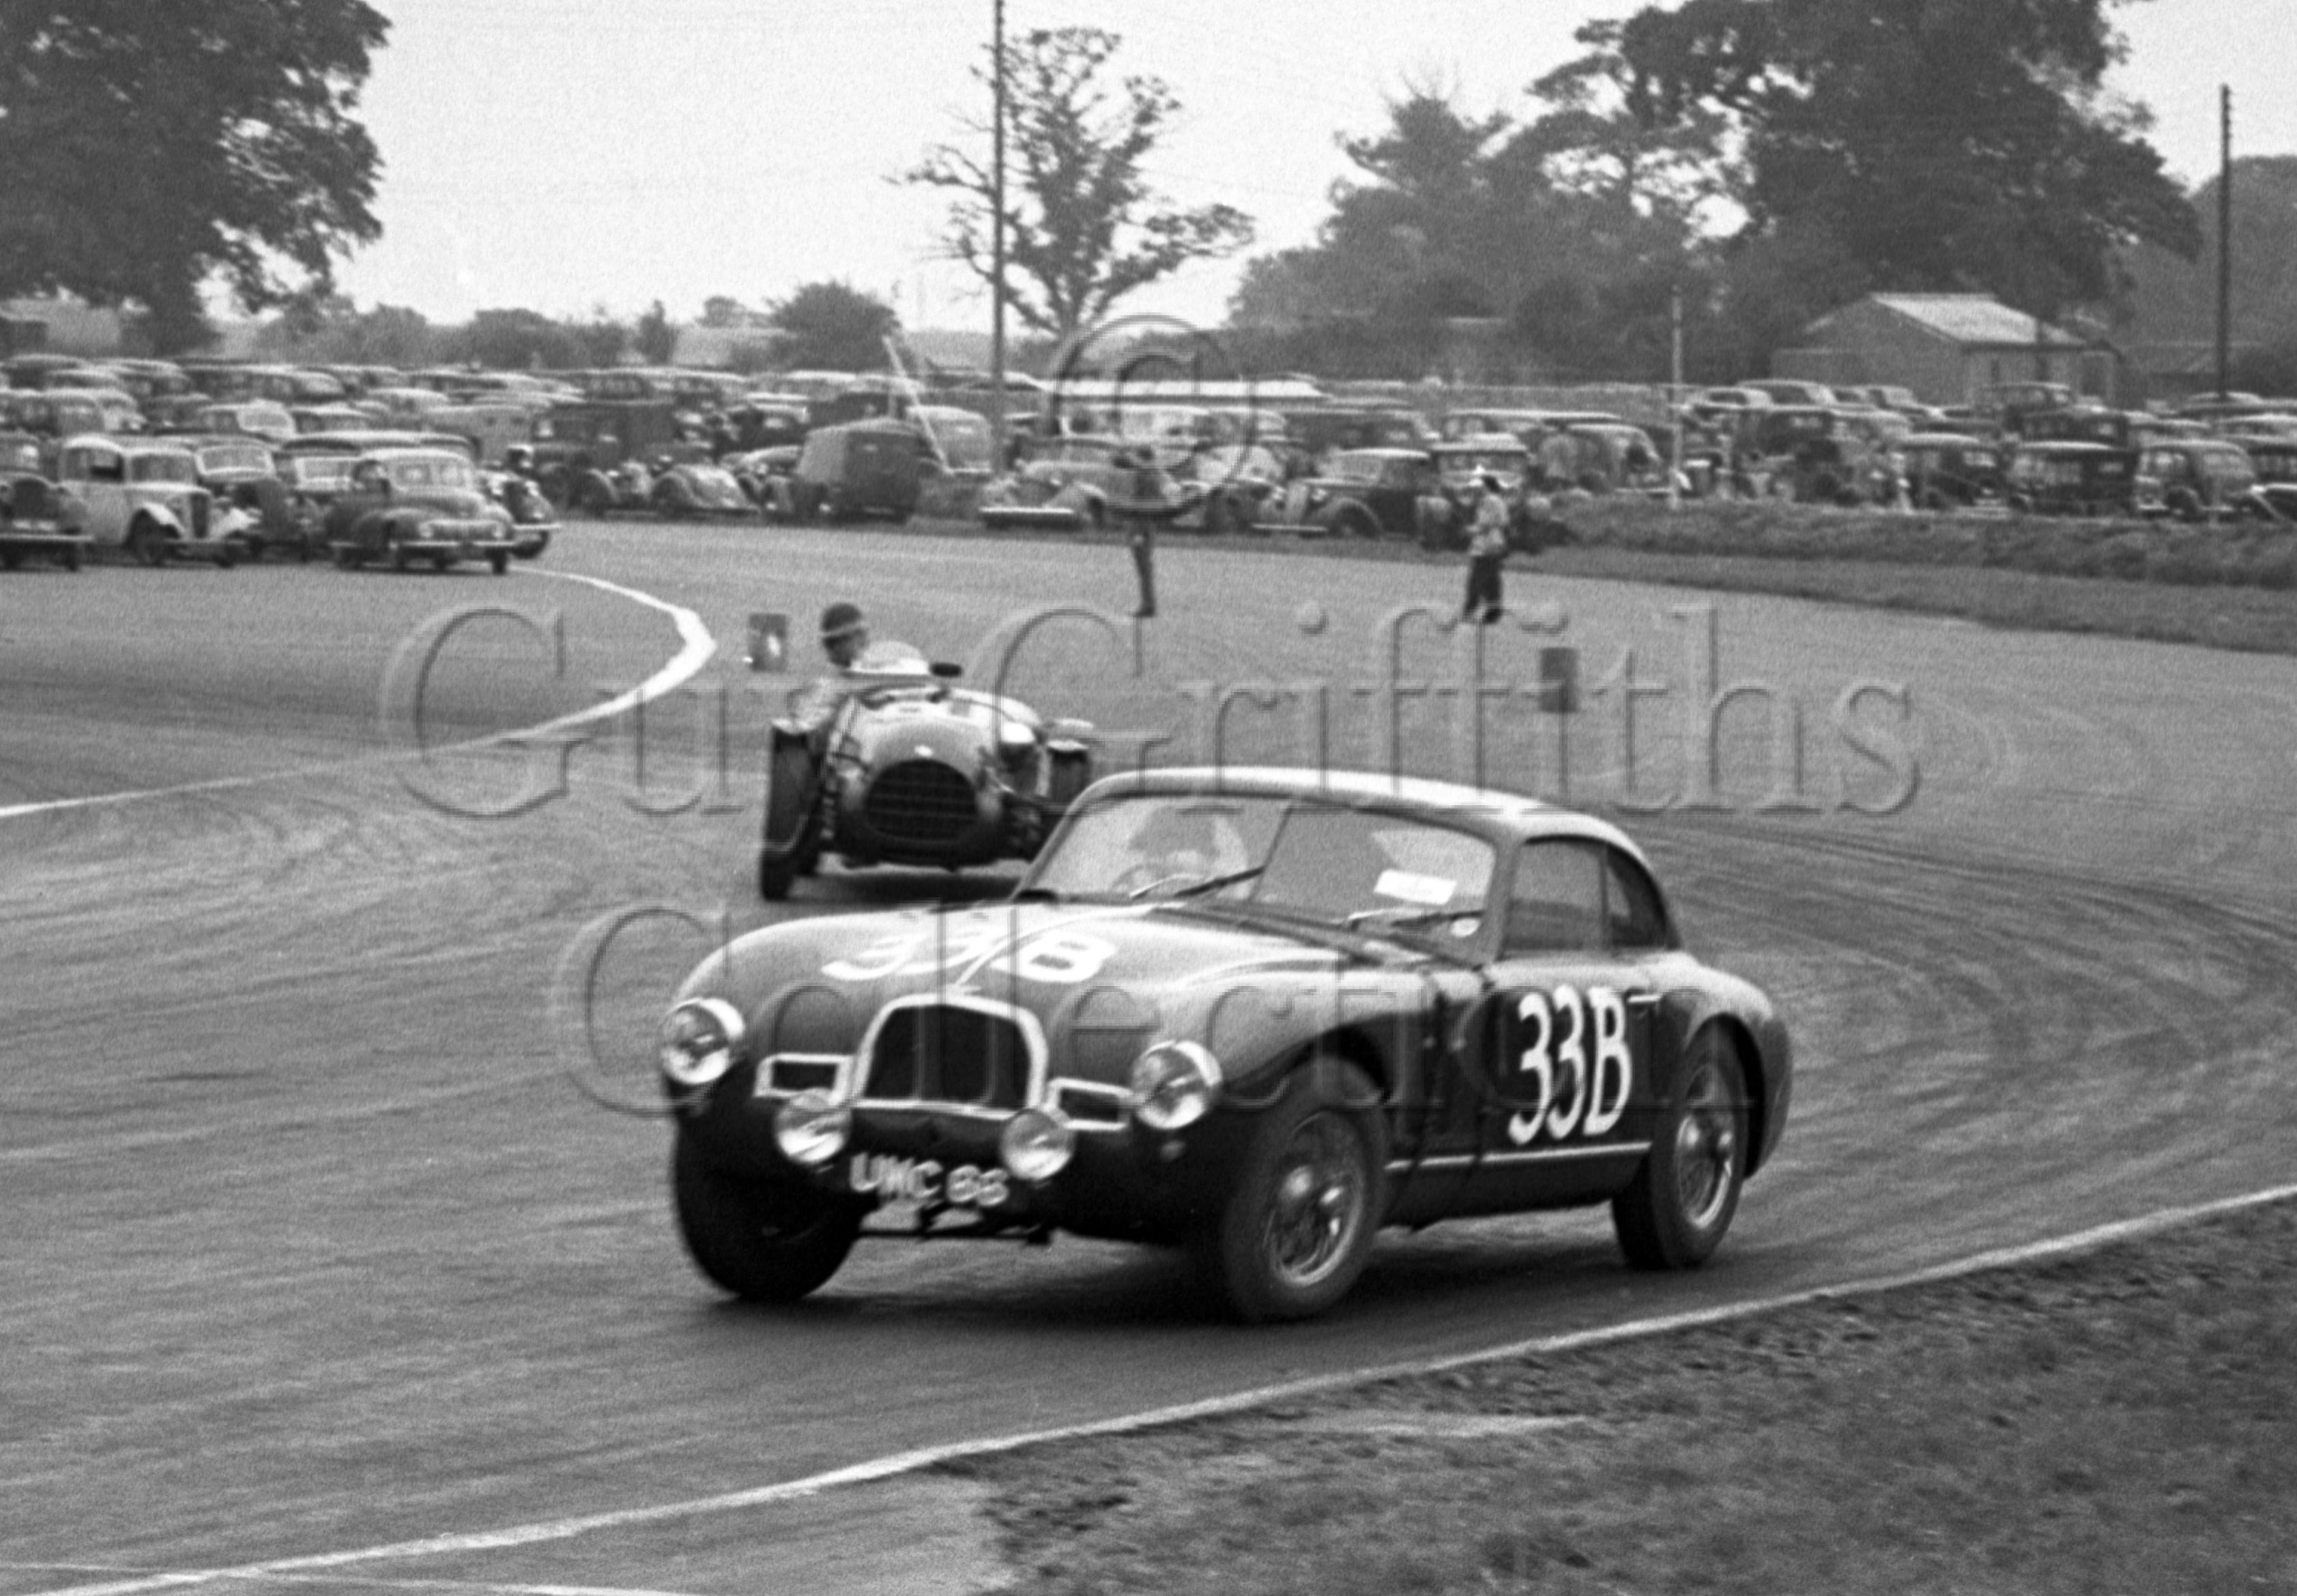 60-94–W-J-Sykes–Aston-Martin-DB2-2580cc–Silverstone–30-08-1952.jpg - Guy Griffiths Collection